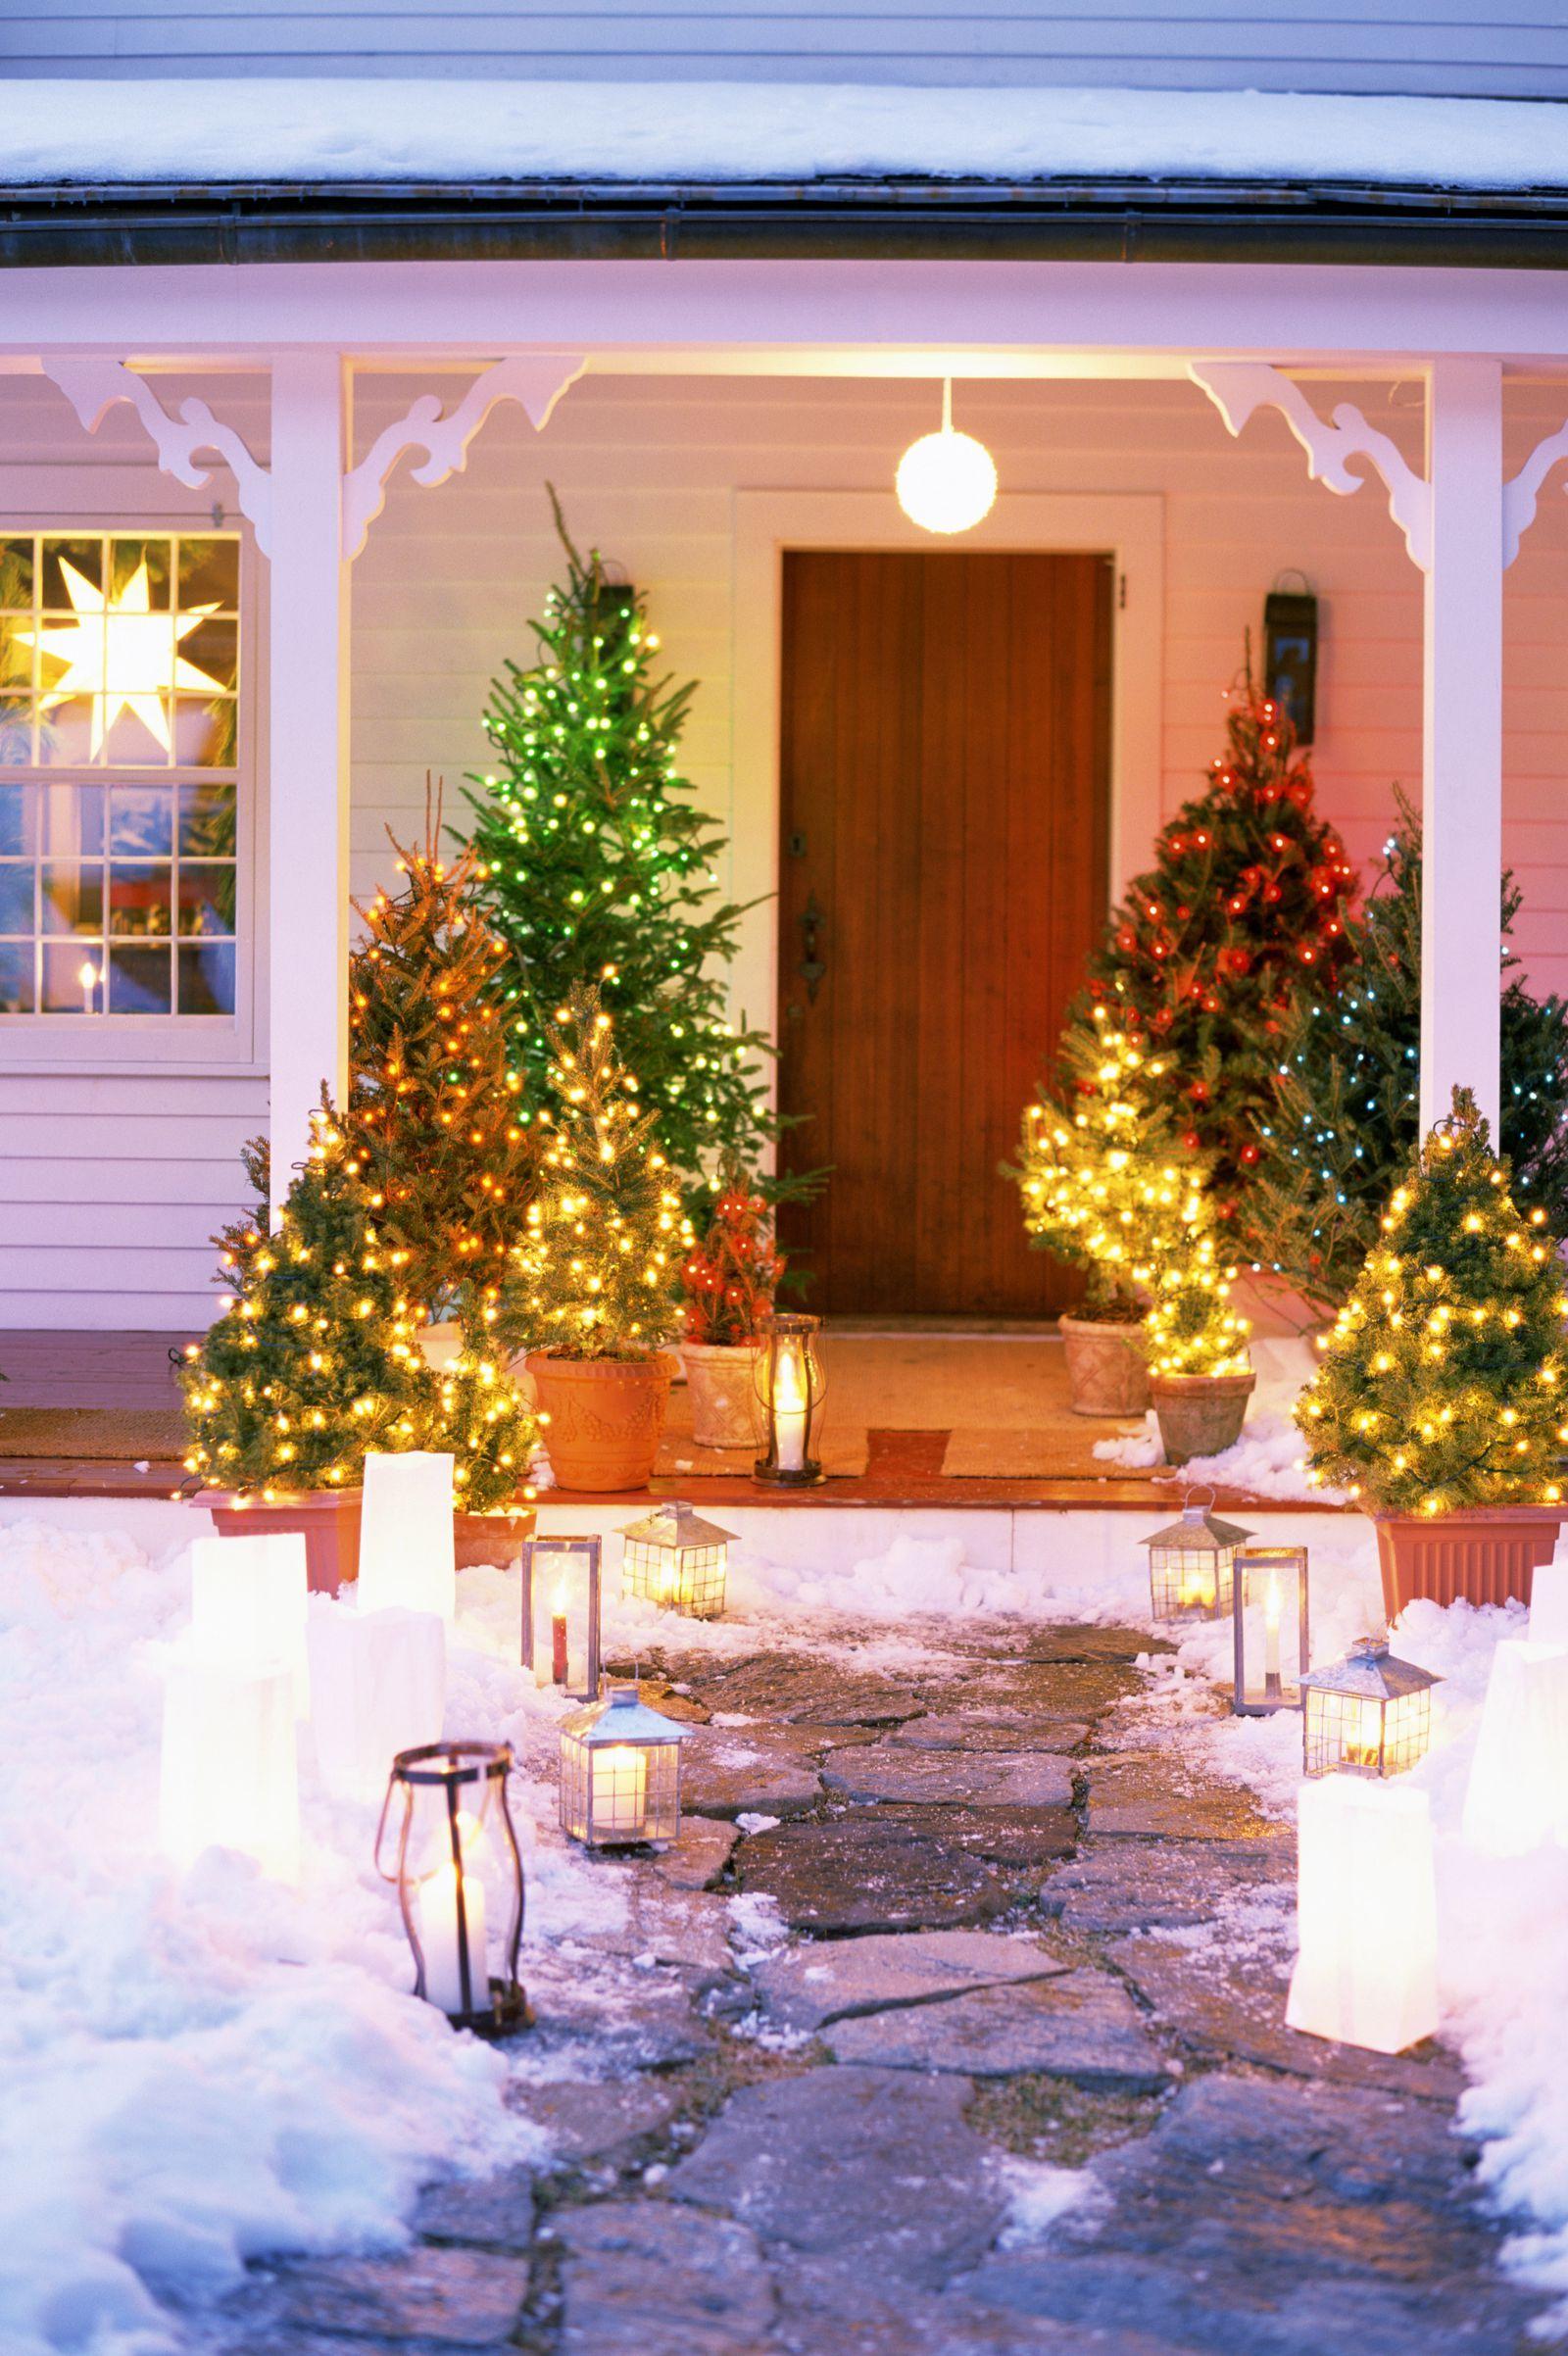 15 christmas light ideas that will top your neighbor s house rh pinterest com